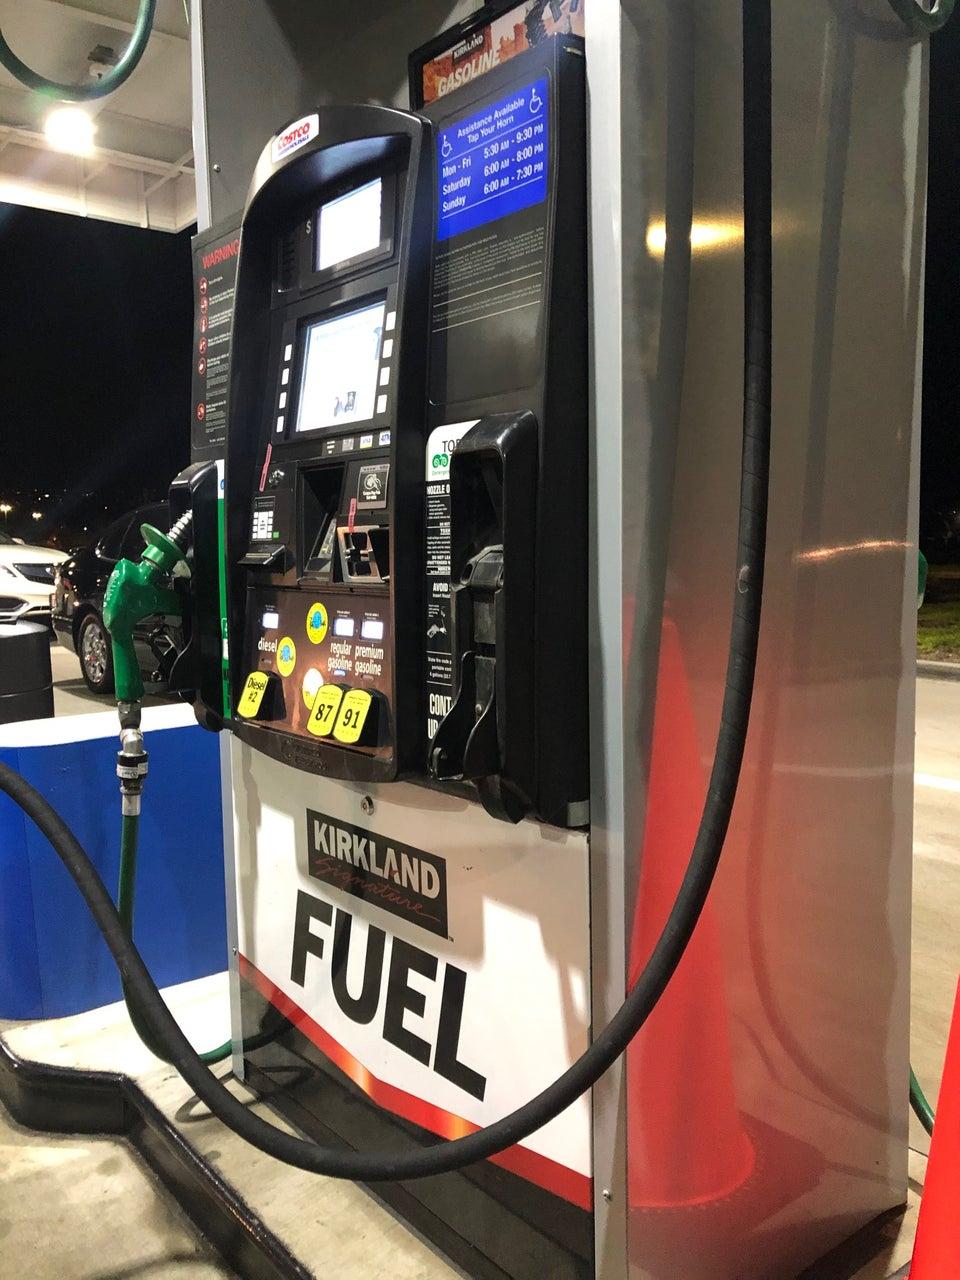 Costco Gas Station 2640 Lomita Blvd, Torrance